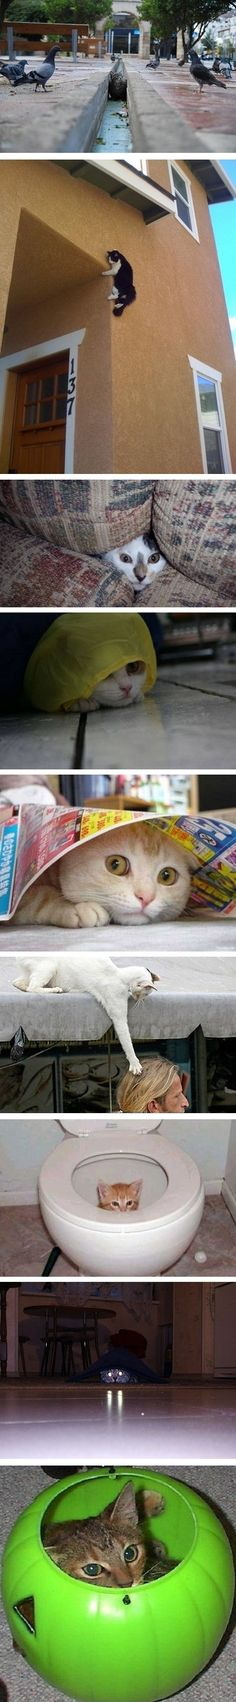 Si James Bond fuera gato..